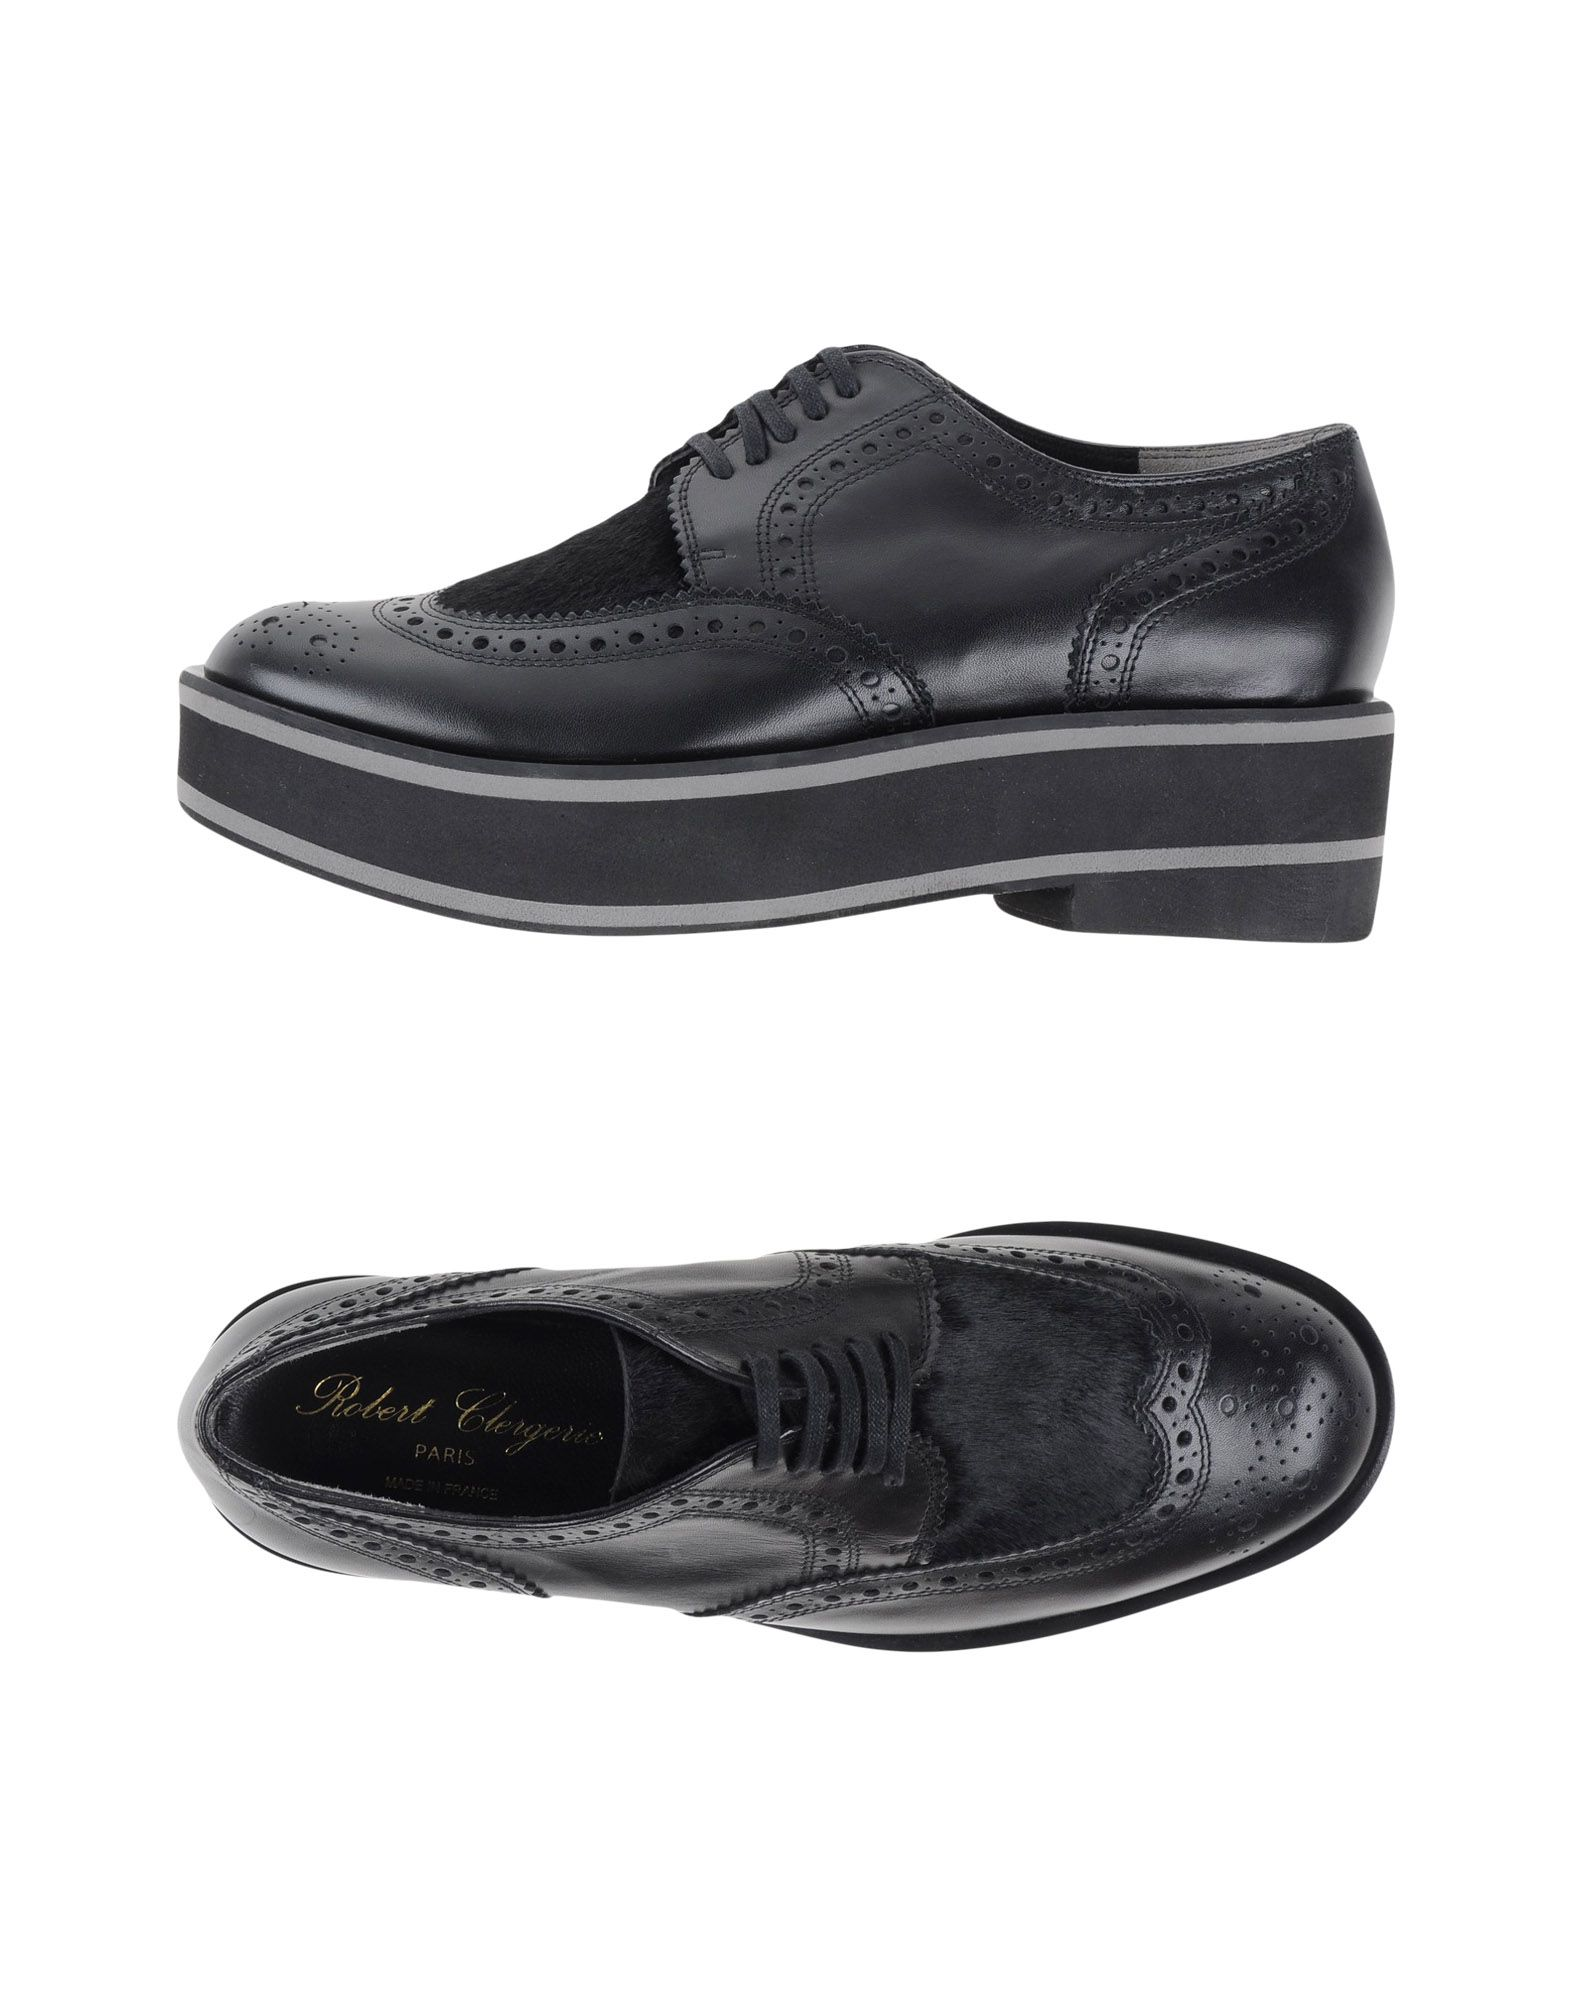 nxn nike ressortissants xc - Robert Clergerie Femme - chaussures, compens��es, sandales, etc. en ...